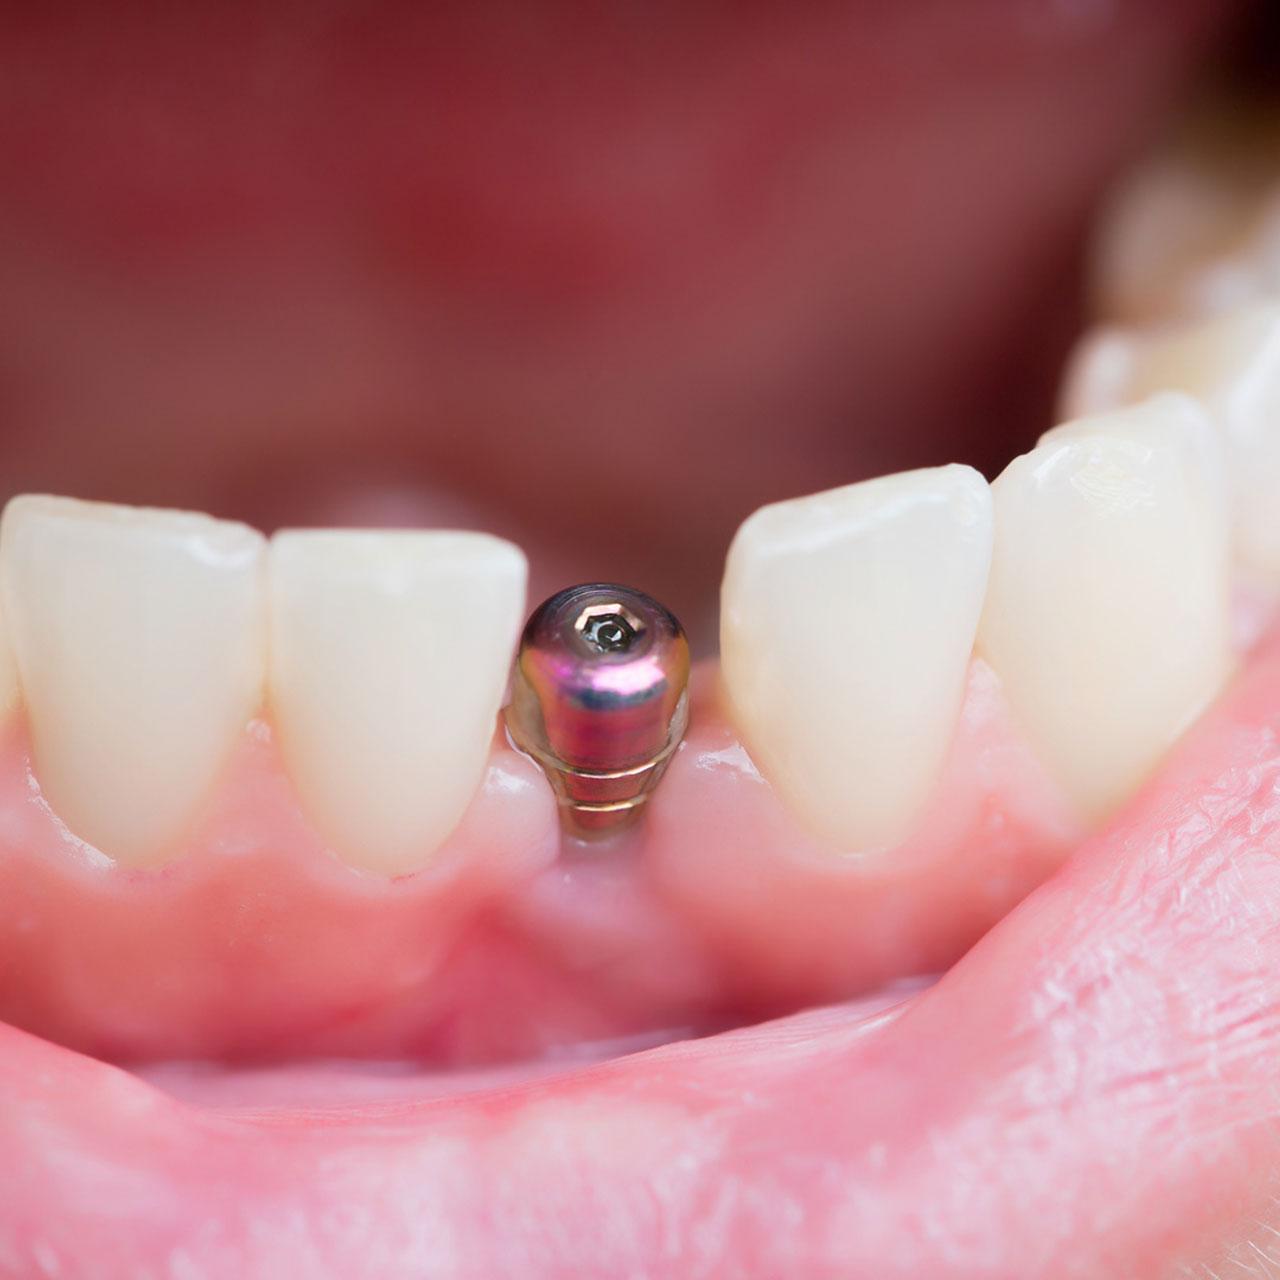 https://medentinadigital.rs/wp-content/uploads/2021/05/implantologija.jpg